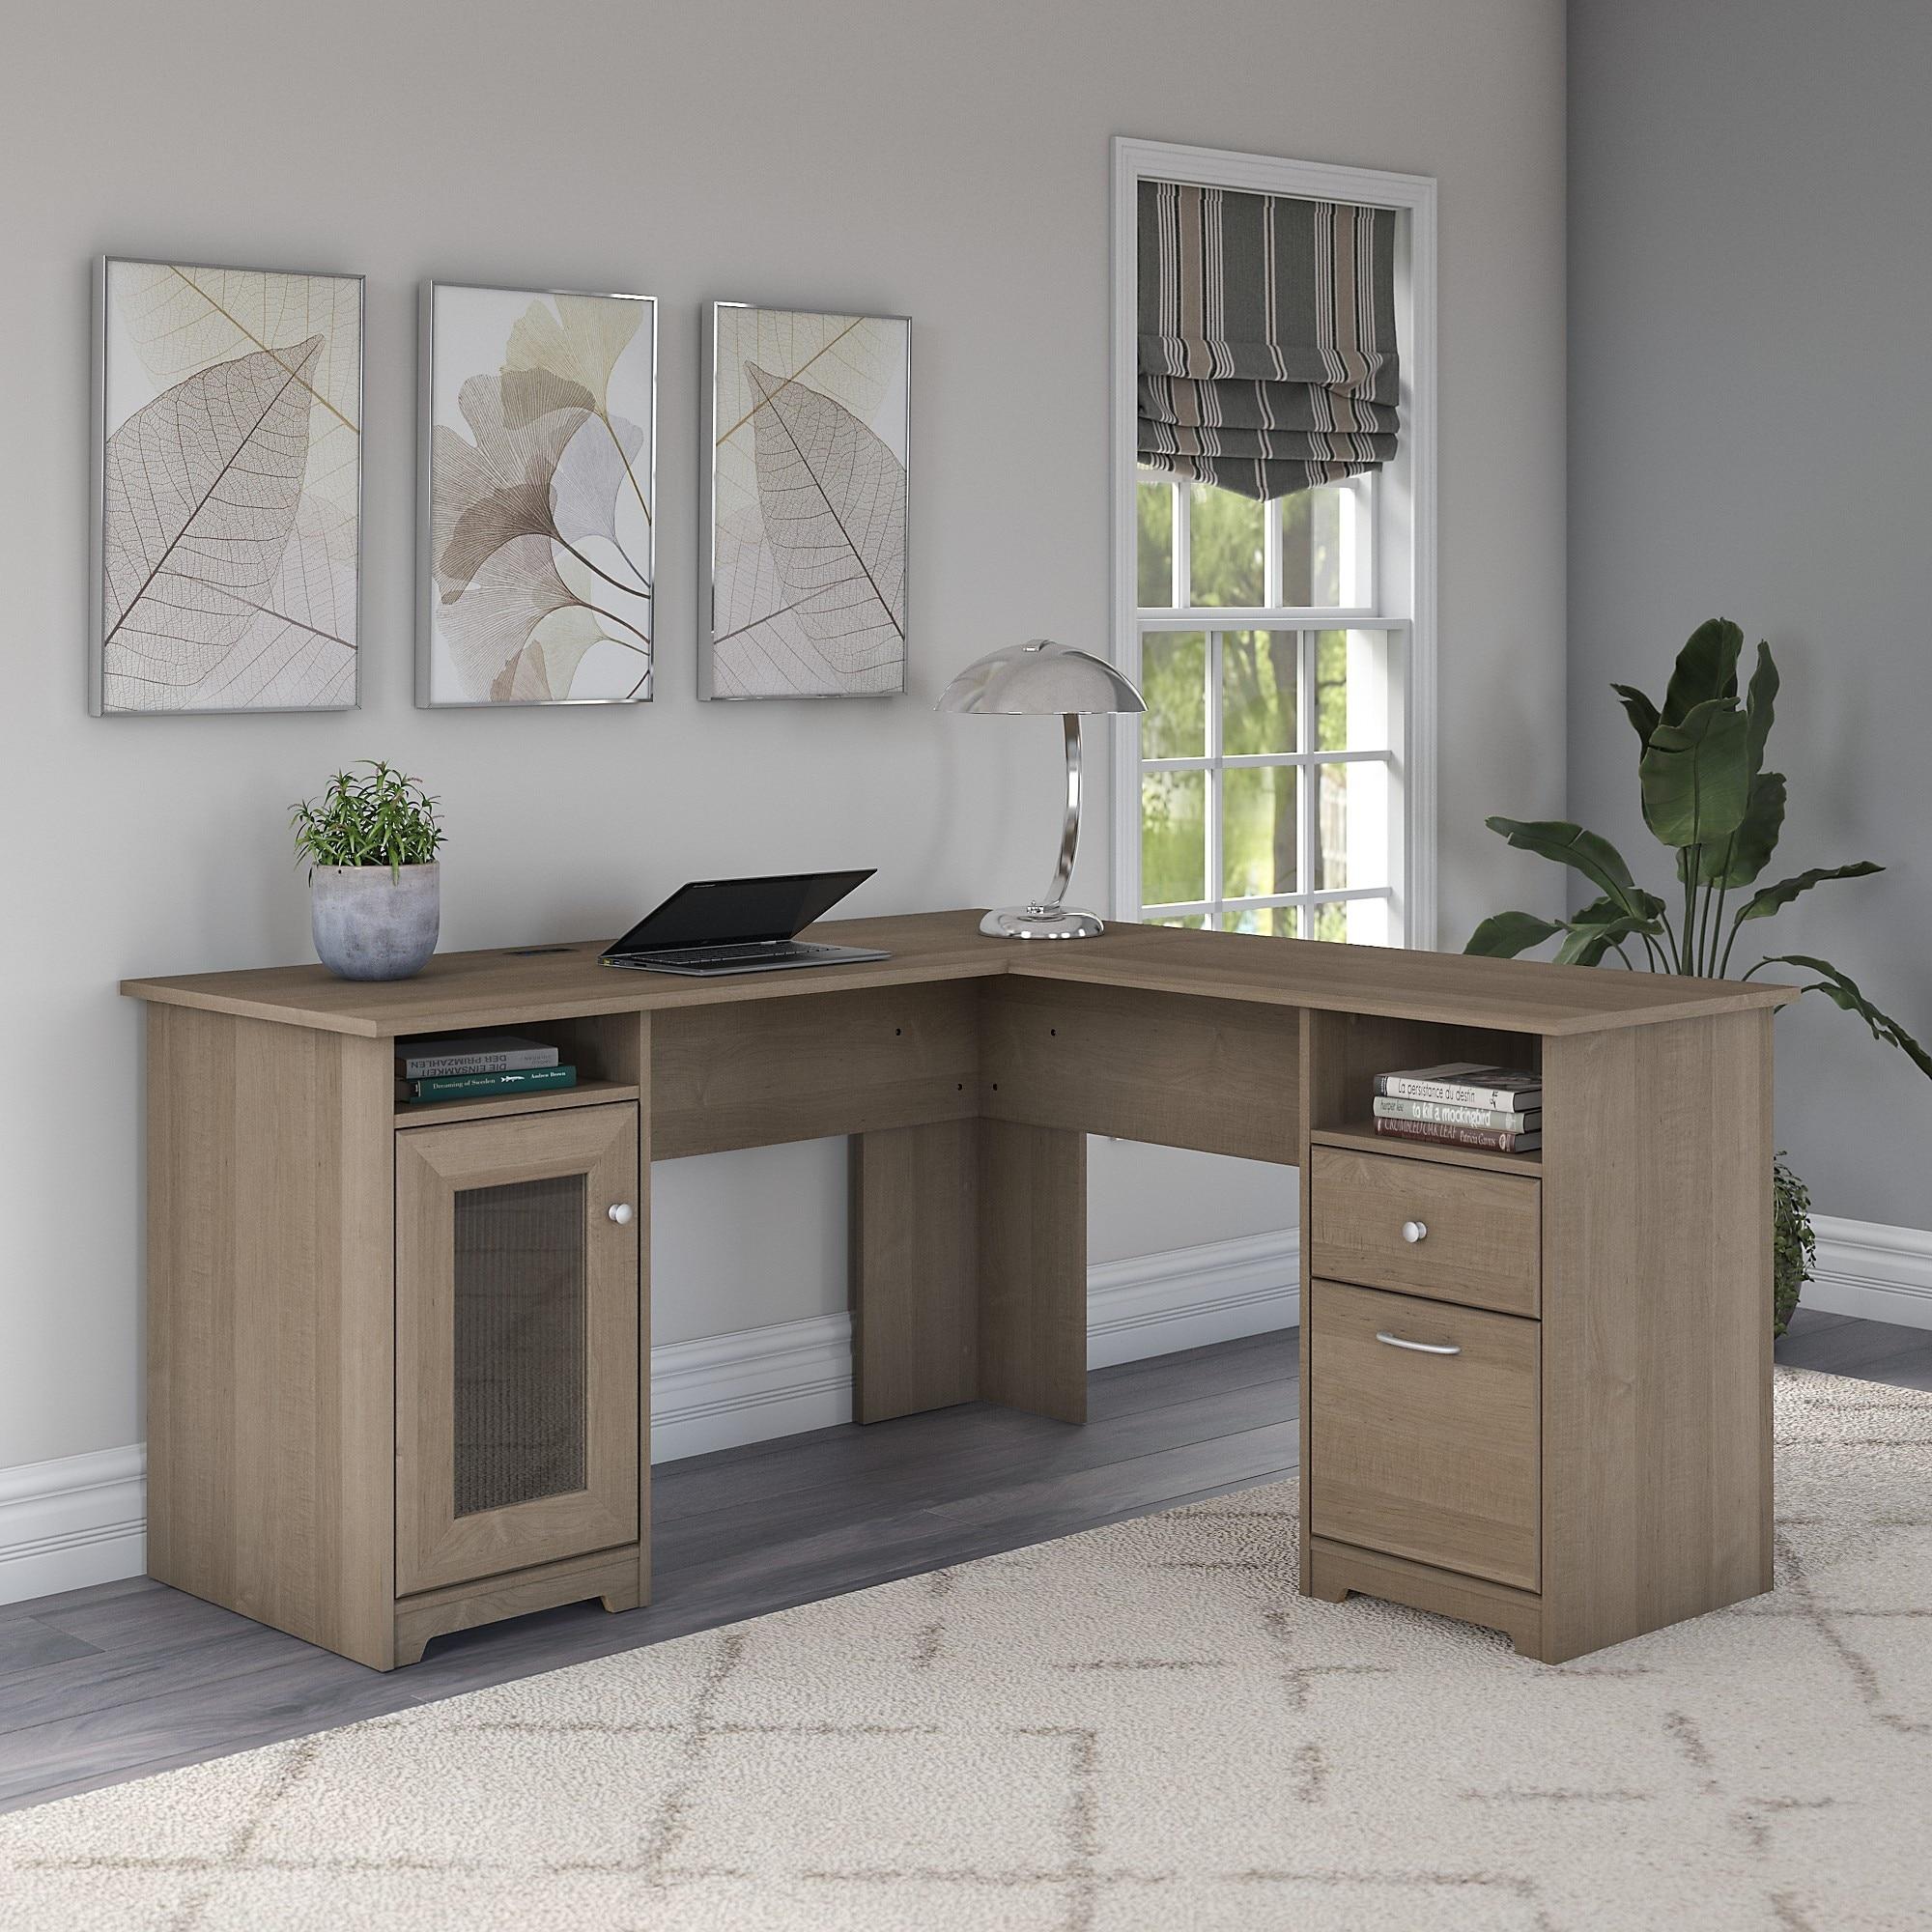 Copper Grove Burgas L Shaped Computer Desk On Sale Overstock 29167876